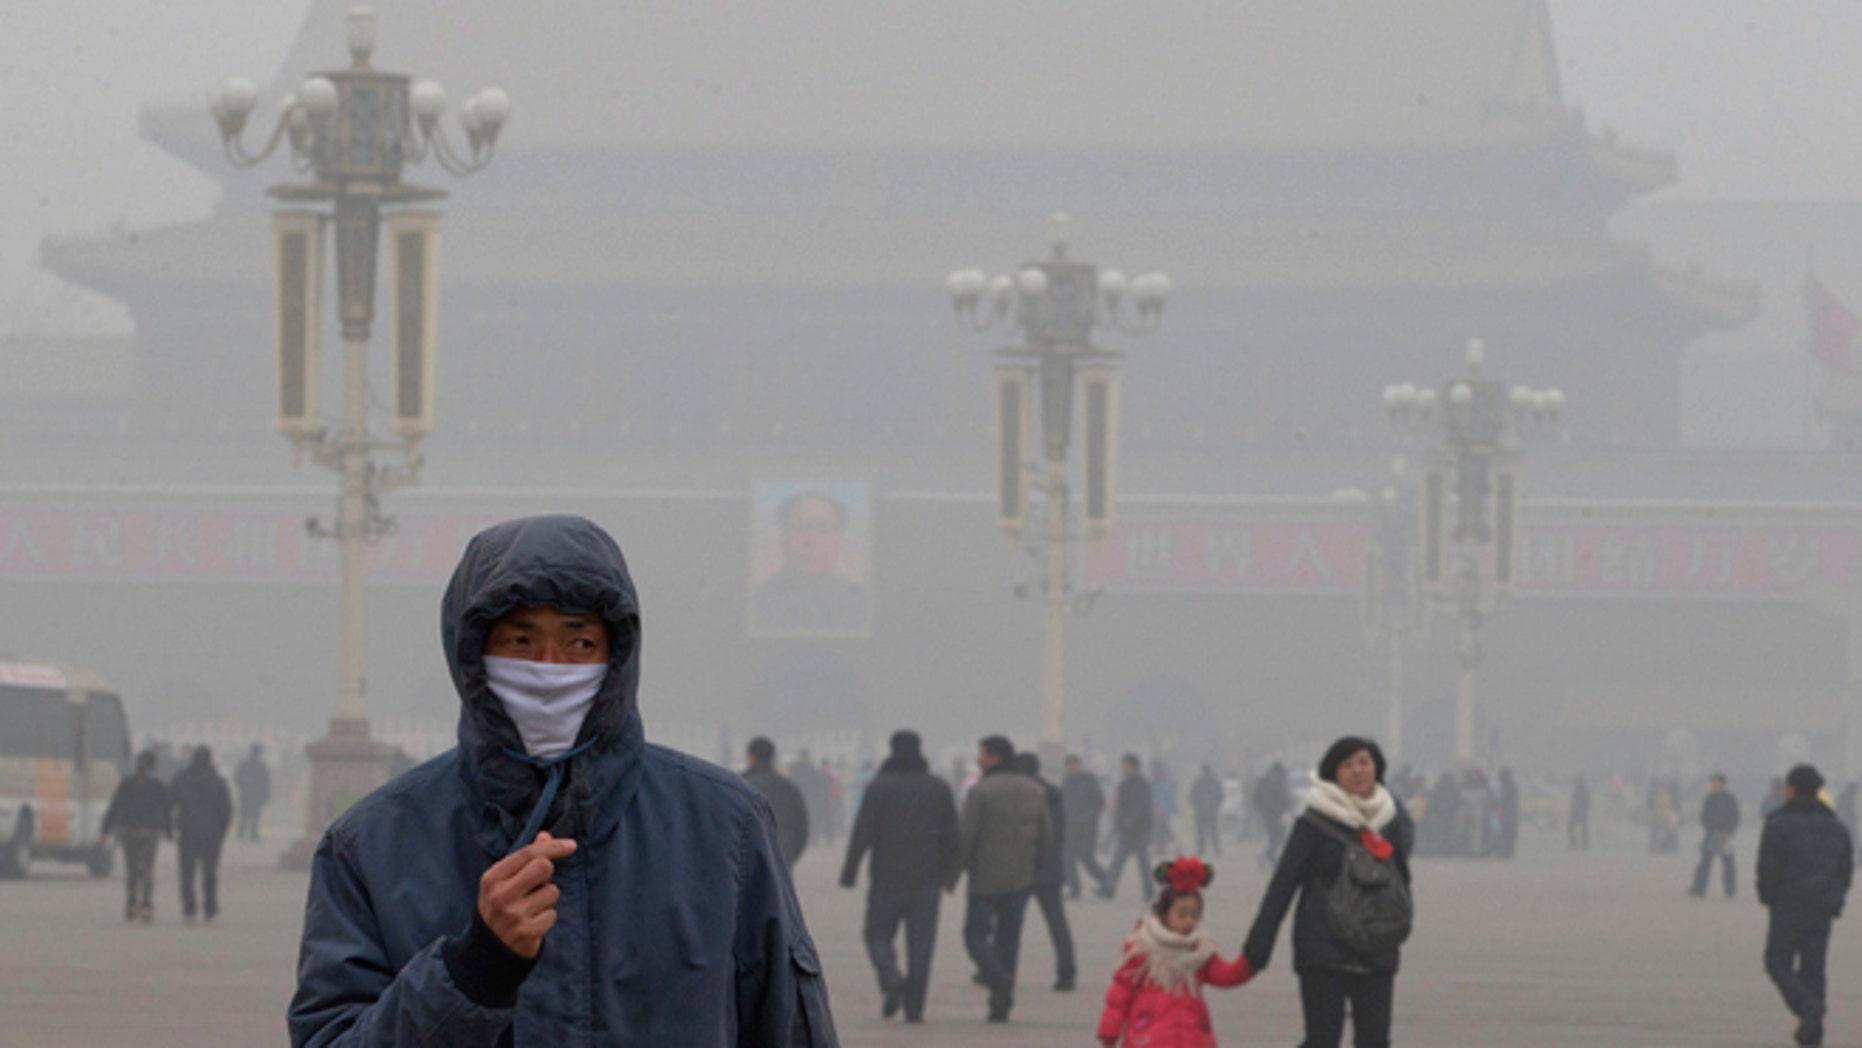 Jan. 29, 2013: A man wears a mask on Tiananmen Square in thick haze in Beijing.